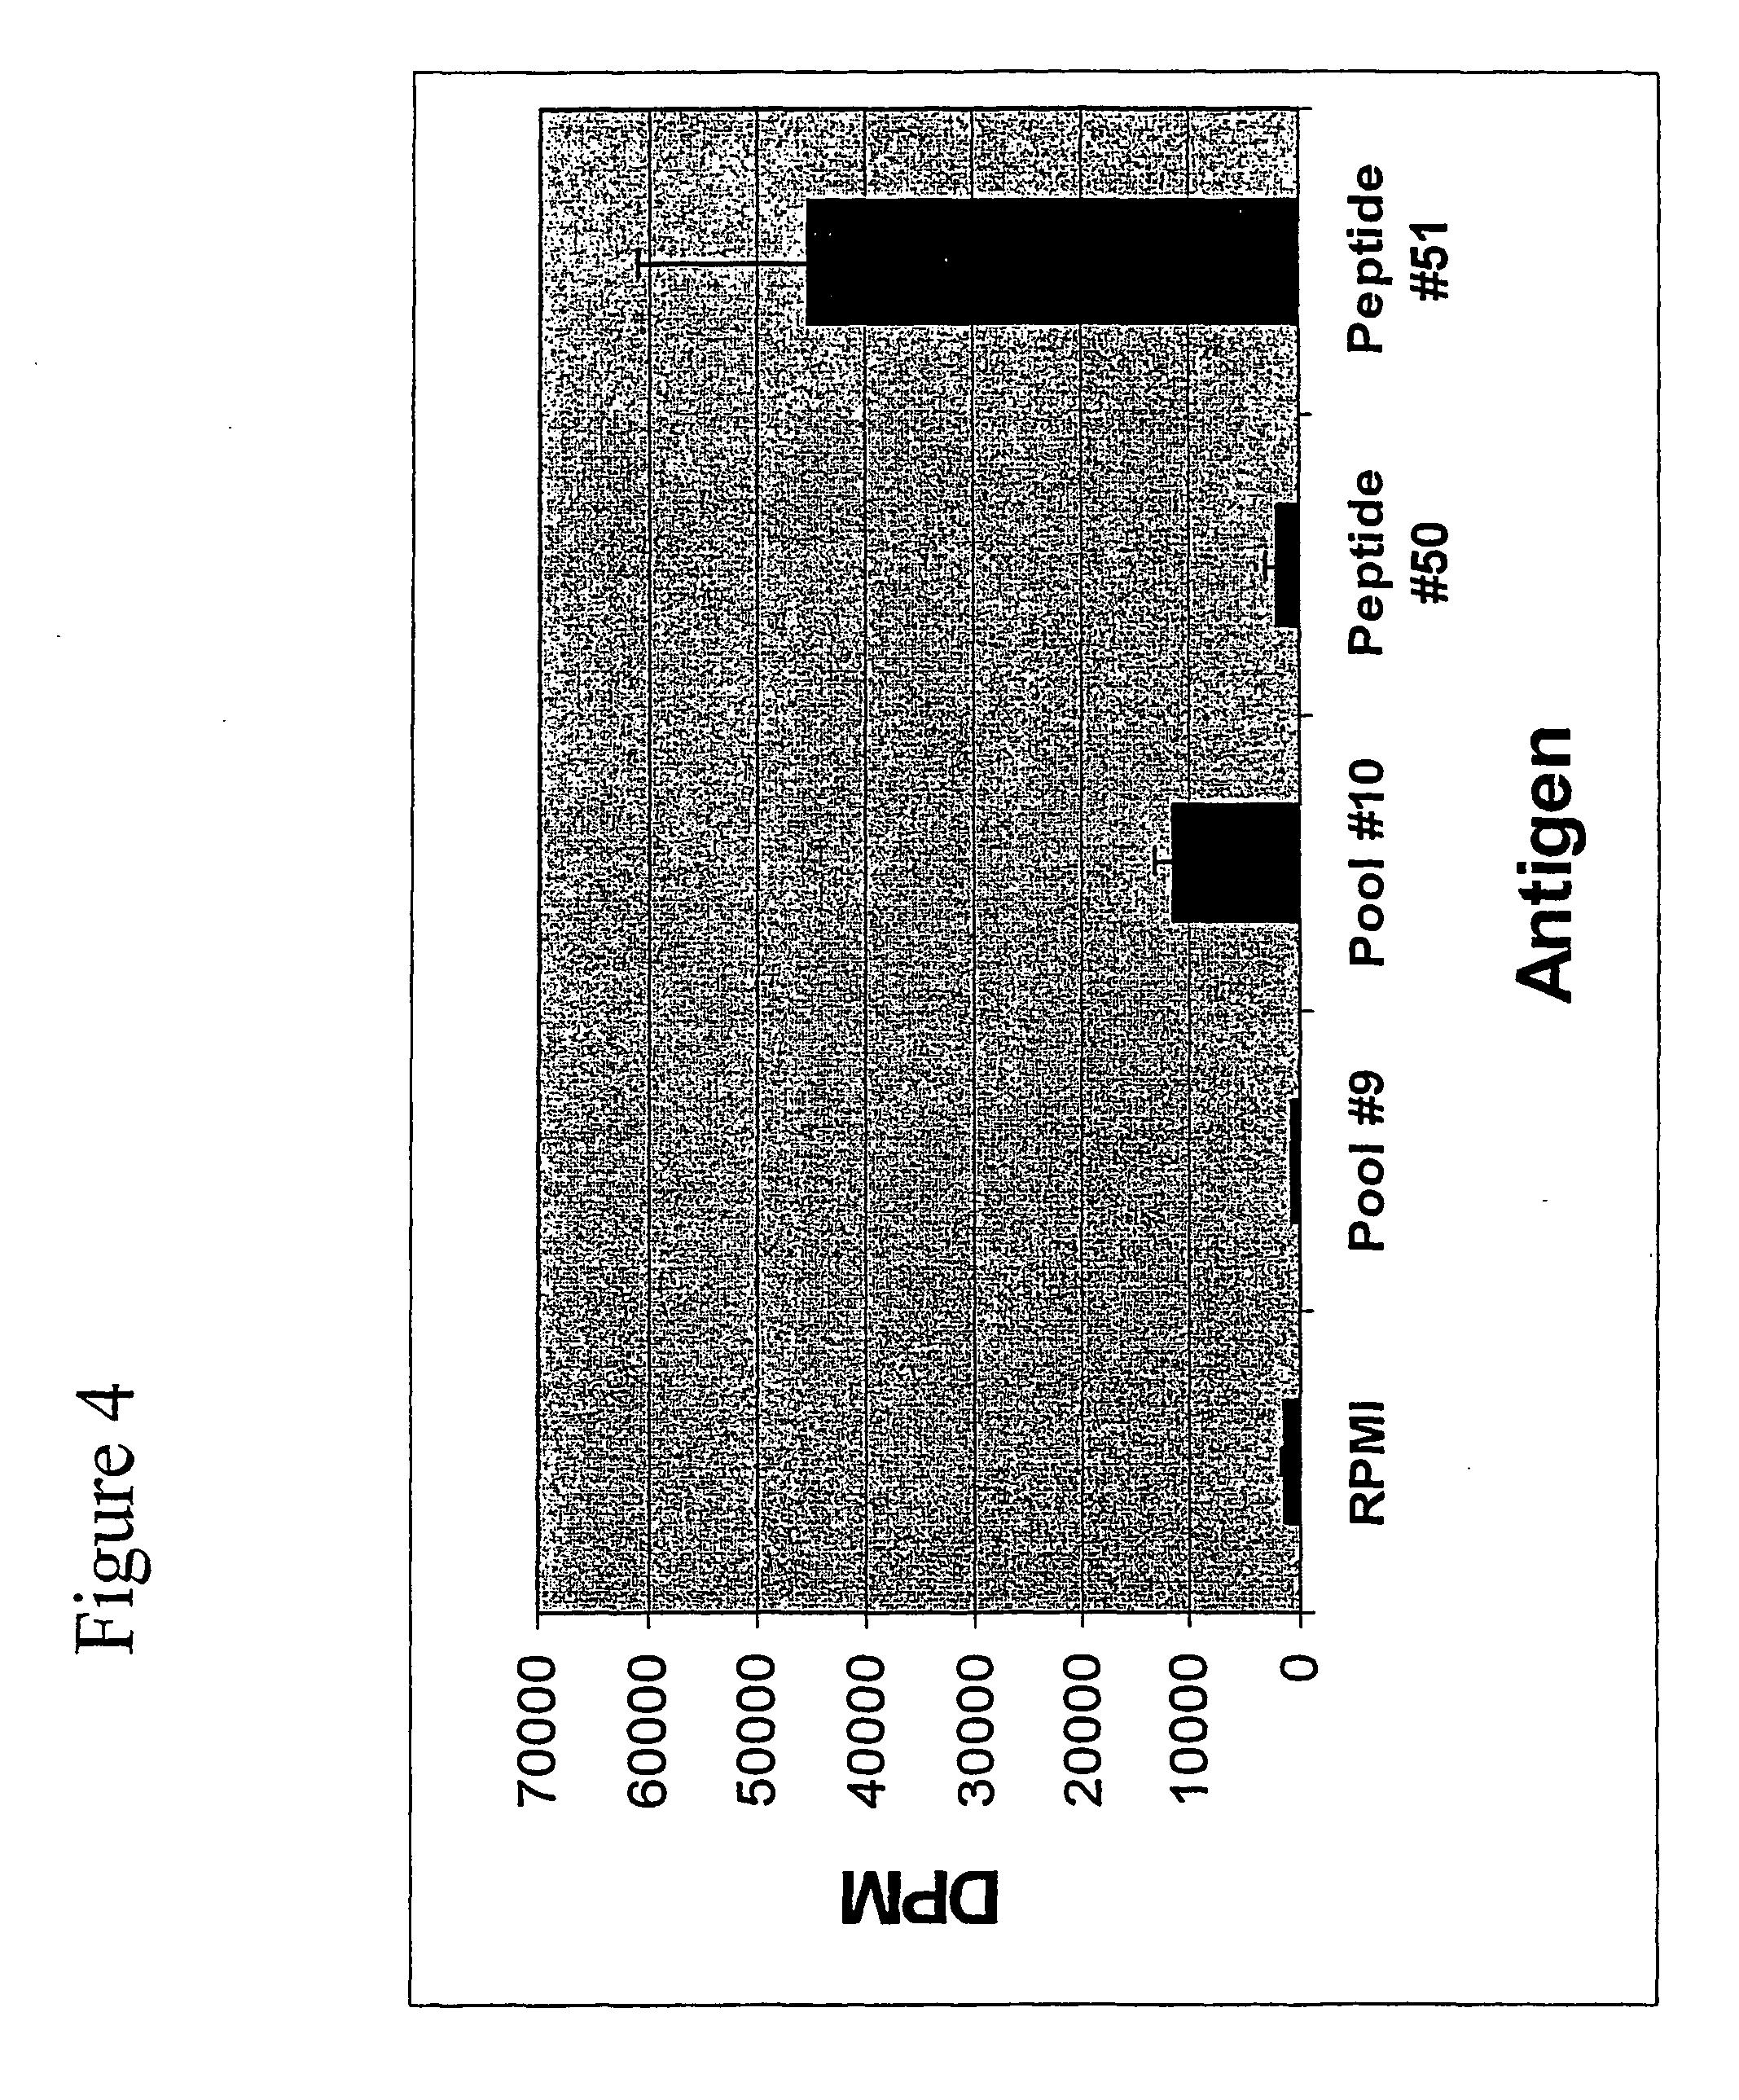 US7910109B2 - MHC class II epitopes of 5T4 antigen - Google